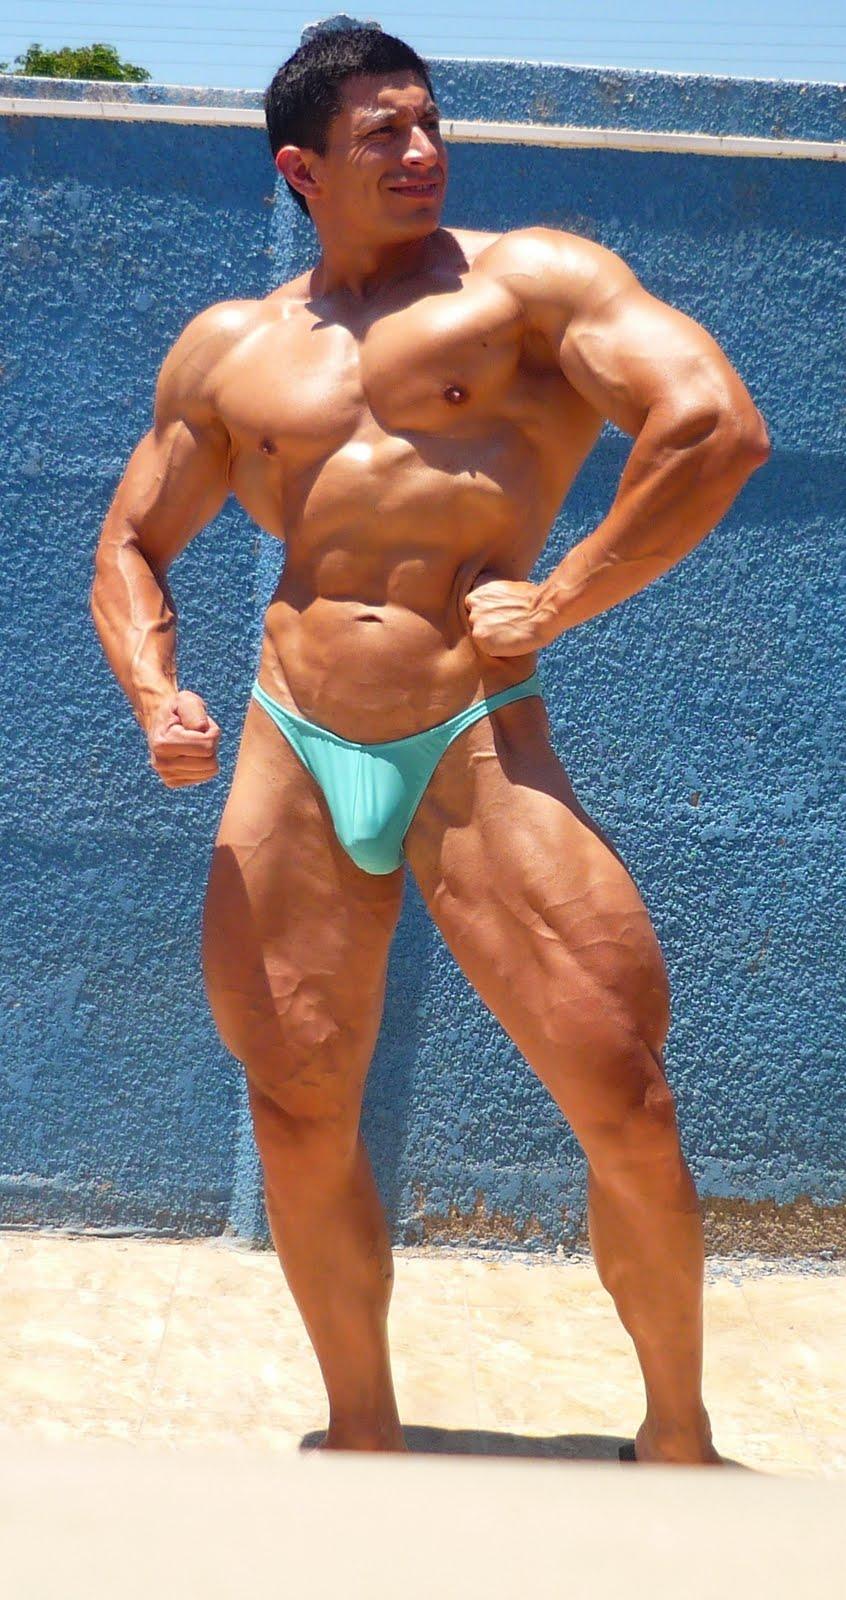 sexy bodybuilding new pics of juan salgado sent by mark